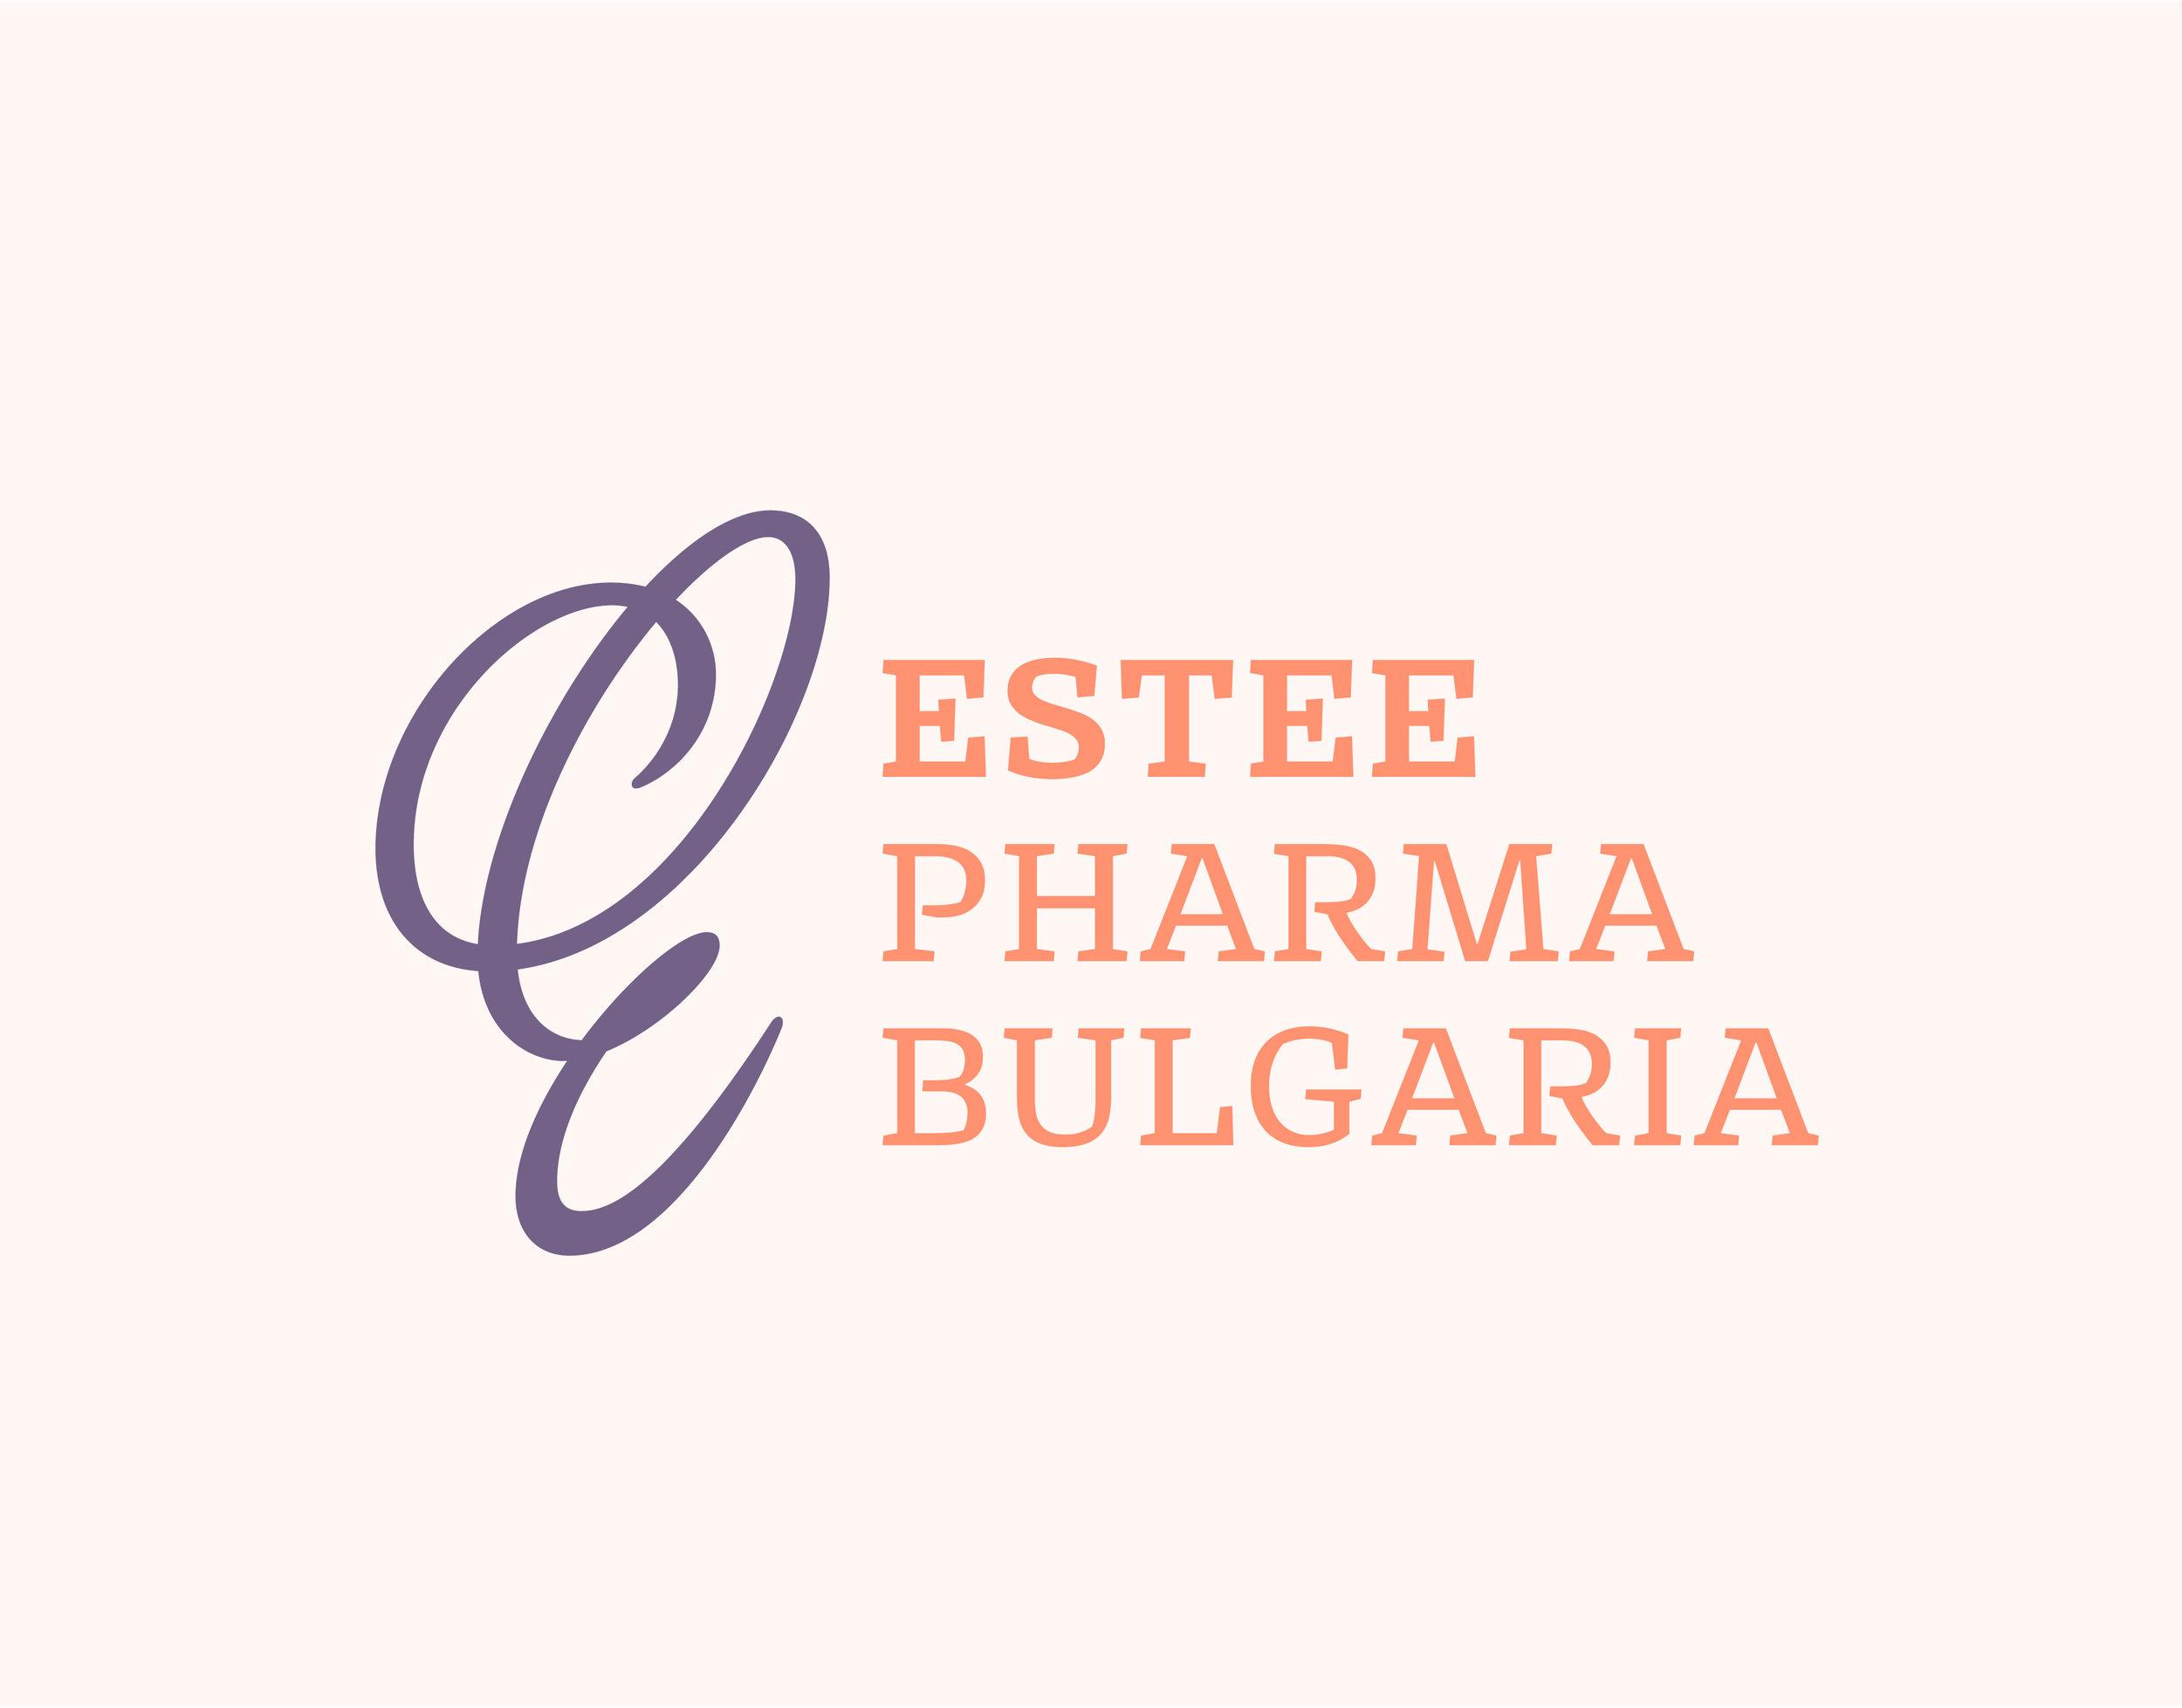 Estee Pharma Bulgaria.jpg